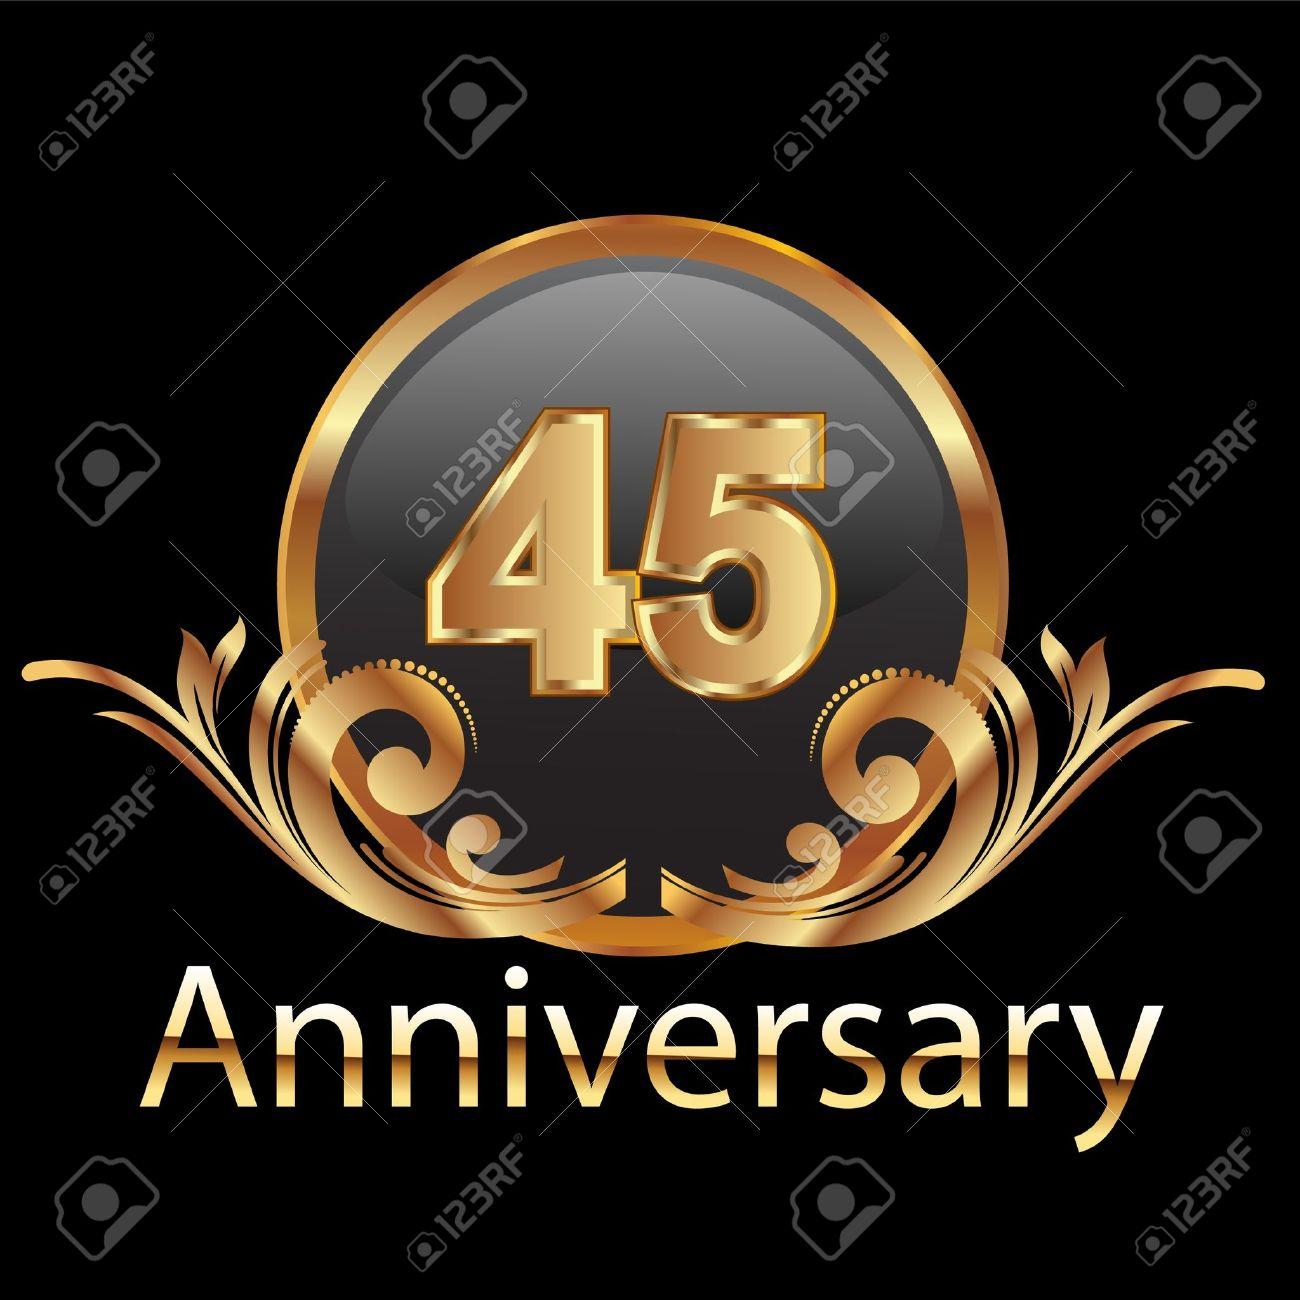 45 anniversary happy birthday Stock Vector - 12379712